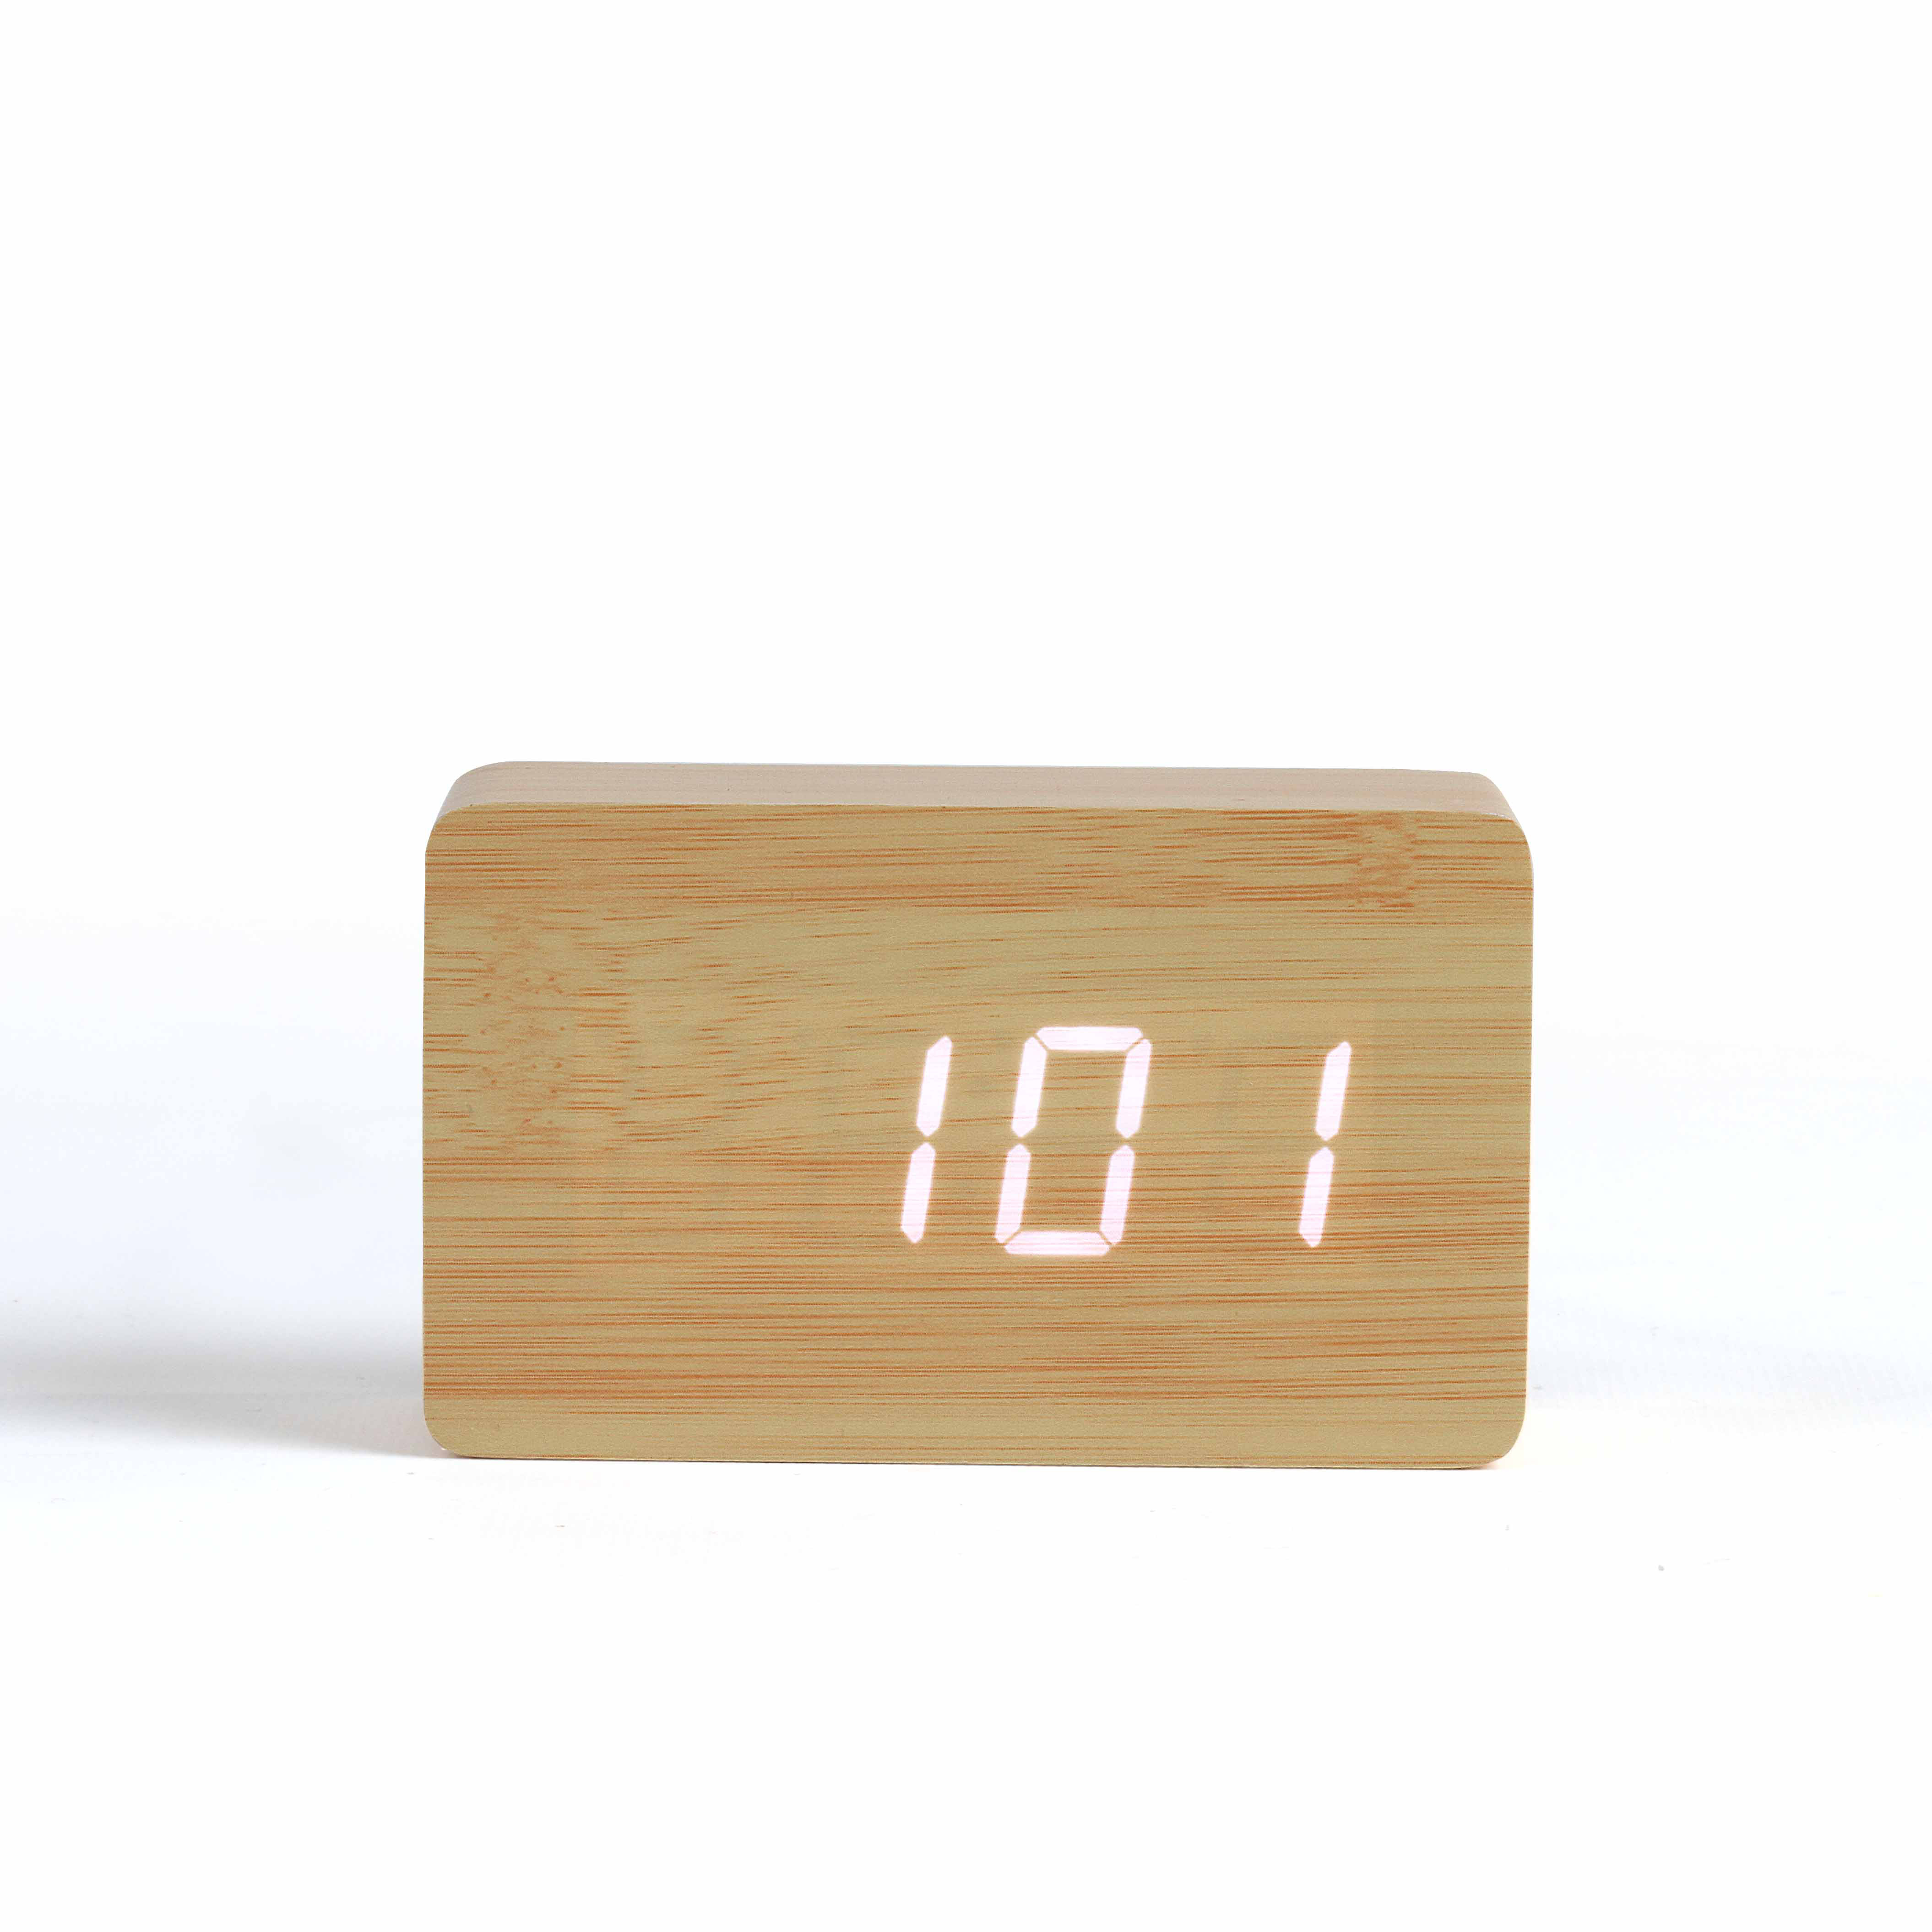 Horloge digitale aspect bois - 30-1229-3